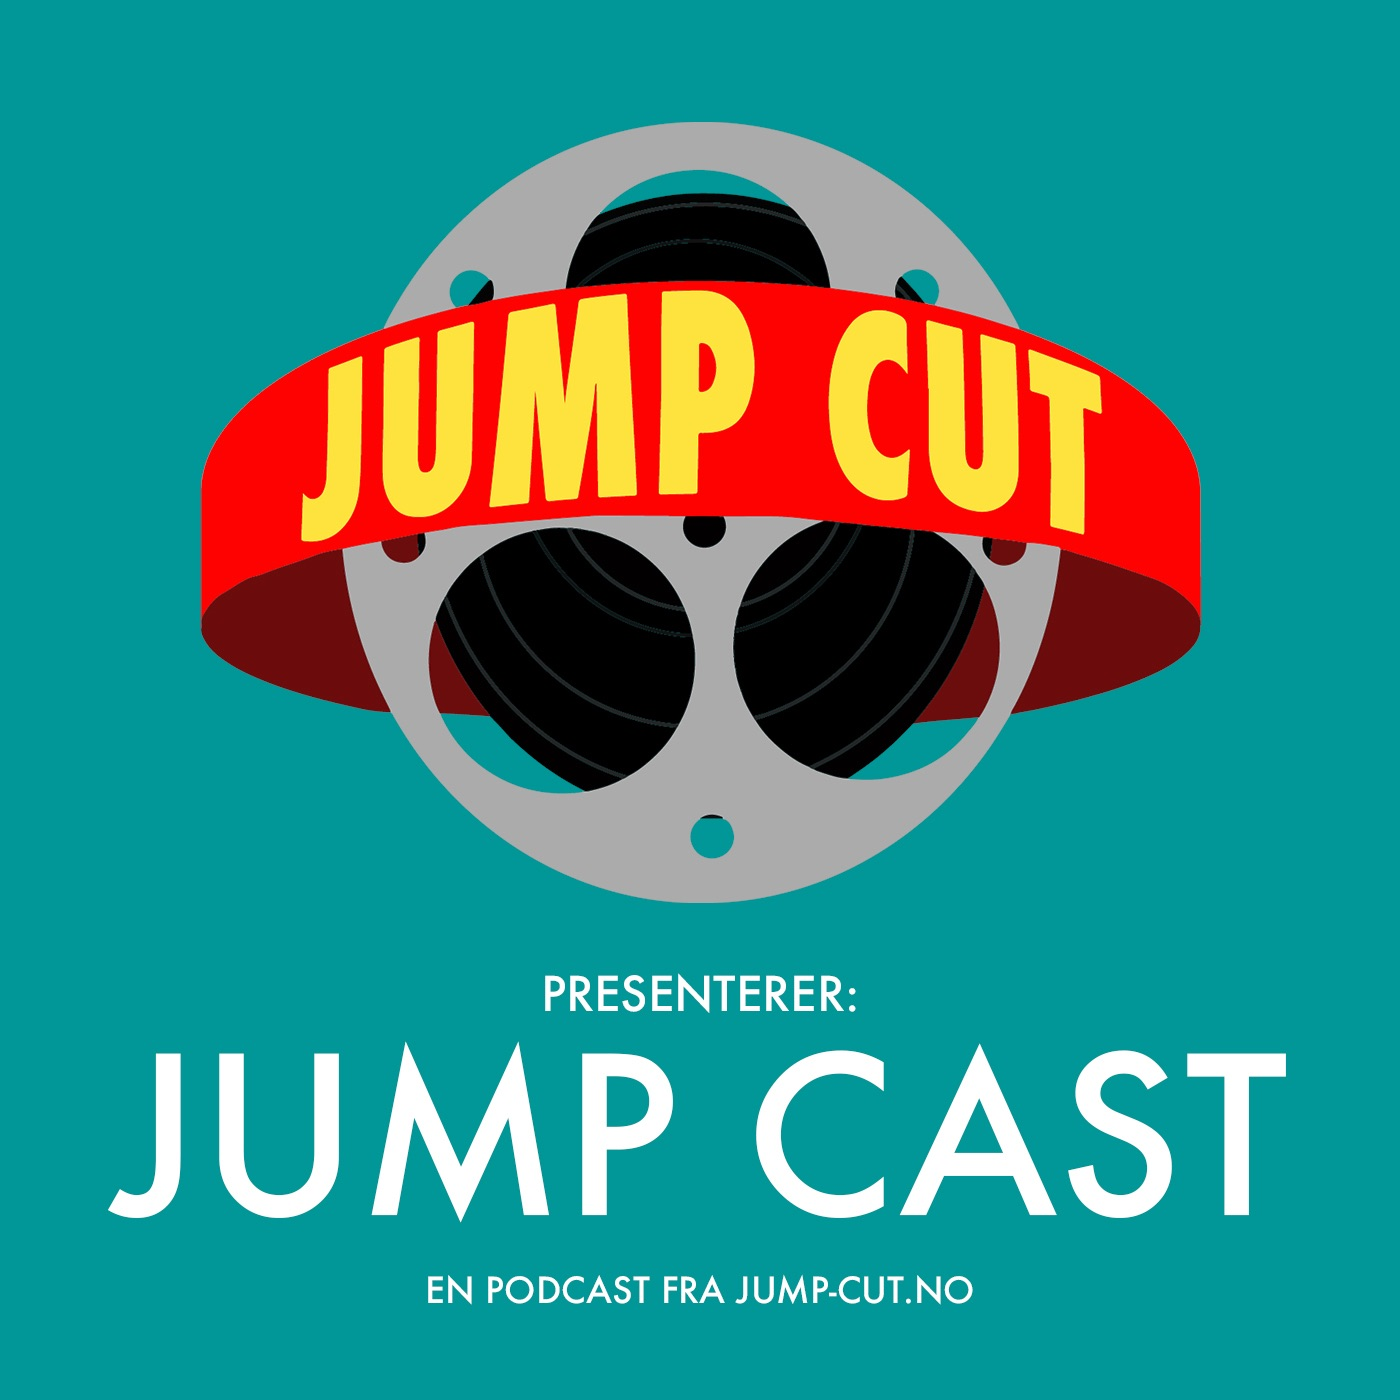 Jump Cast